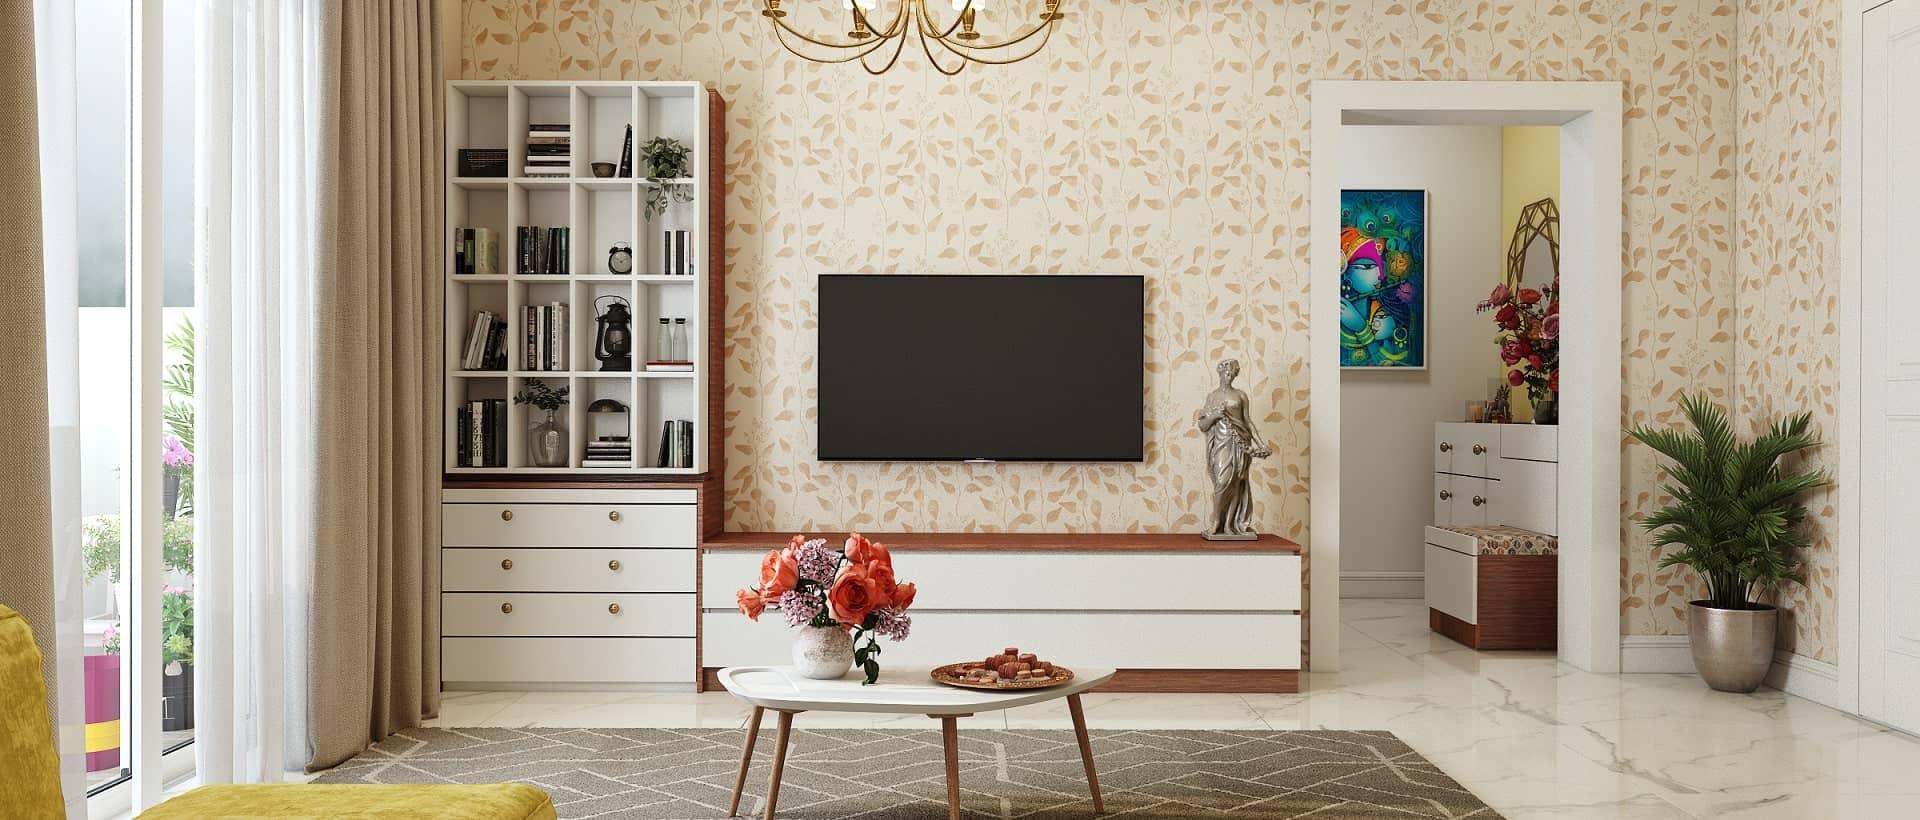 Home Interiors by best home interior design studio of Design Cafe.